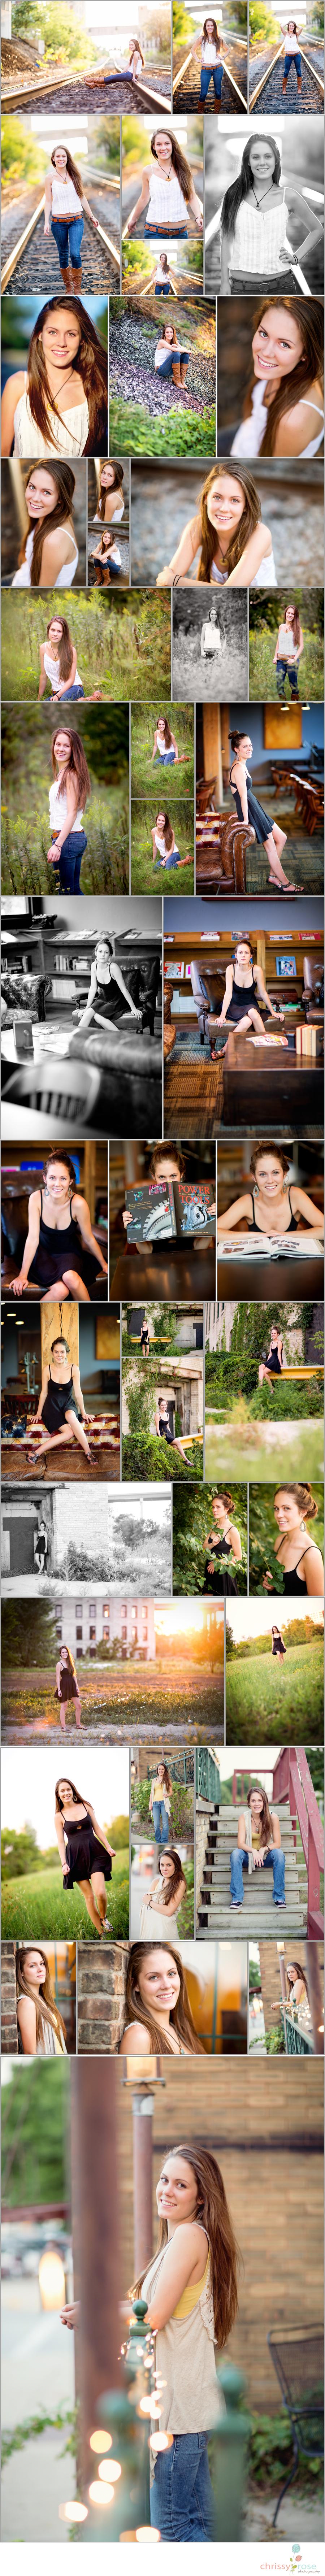 Blog Collage-1351803029829